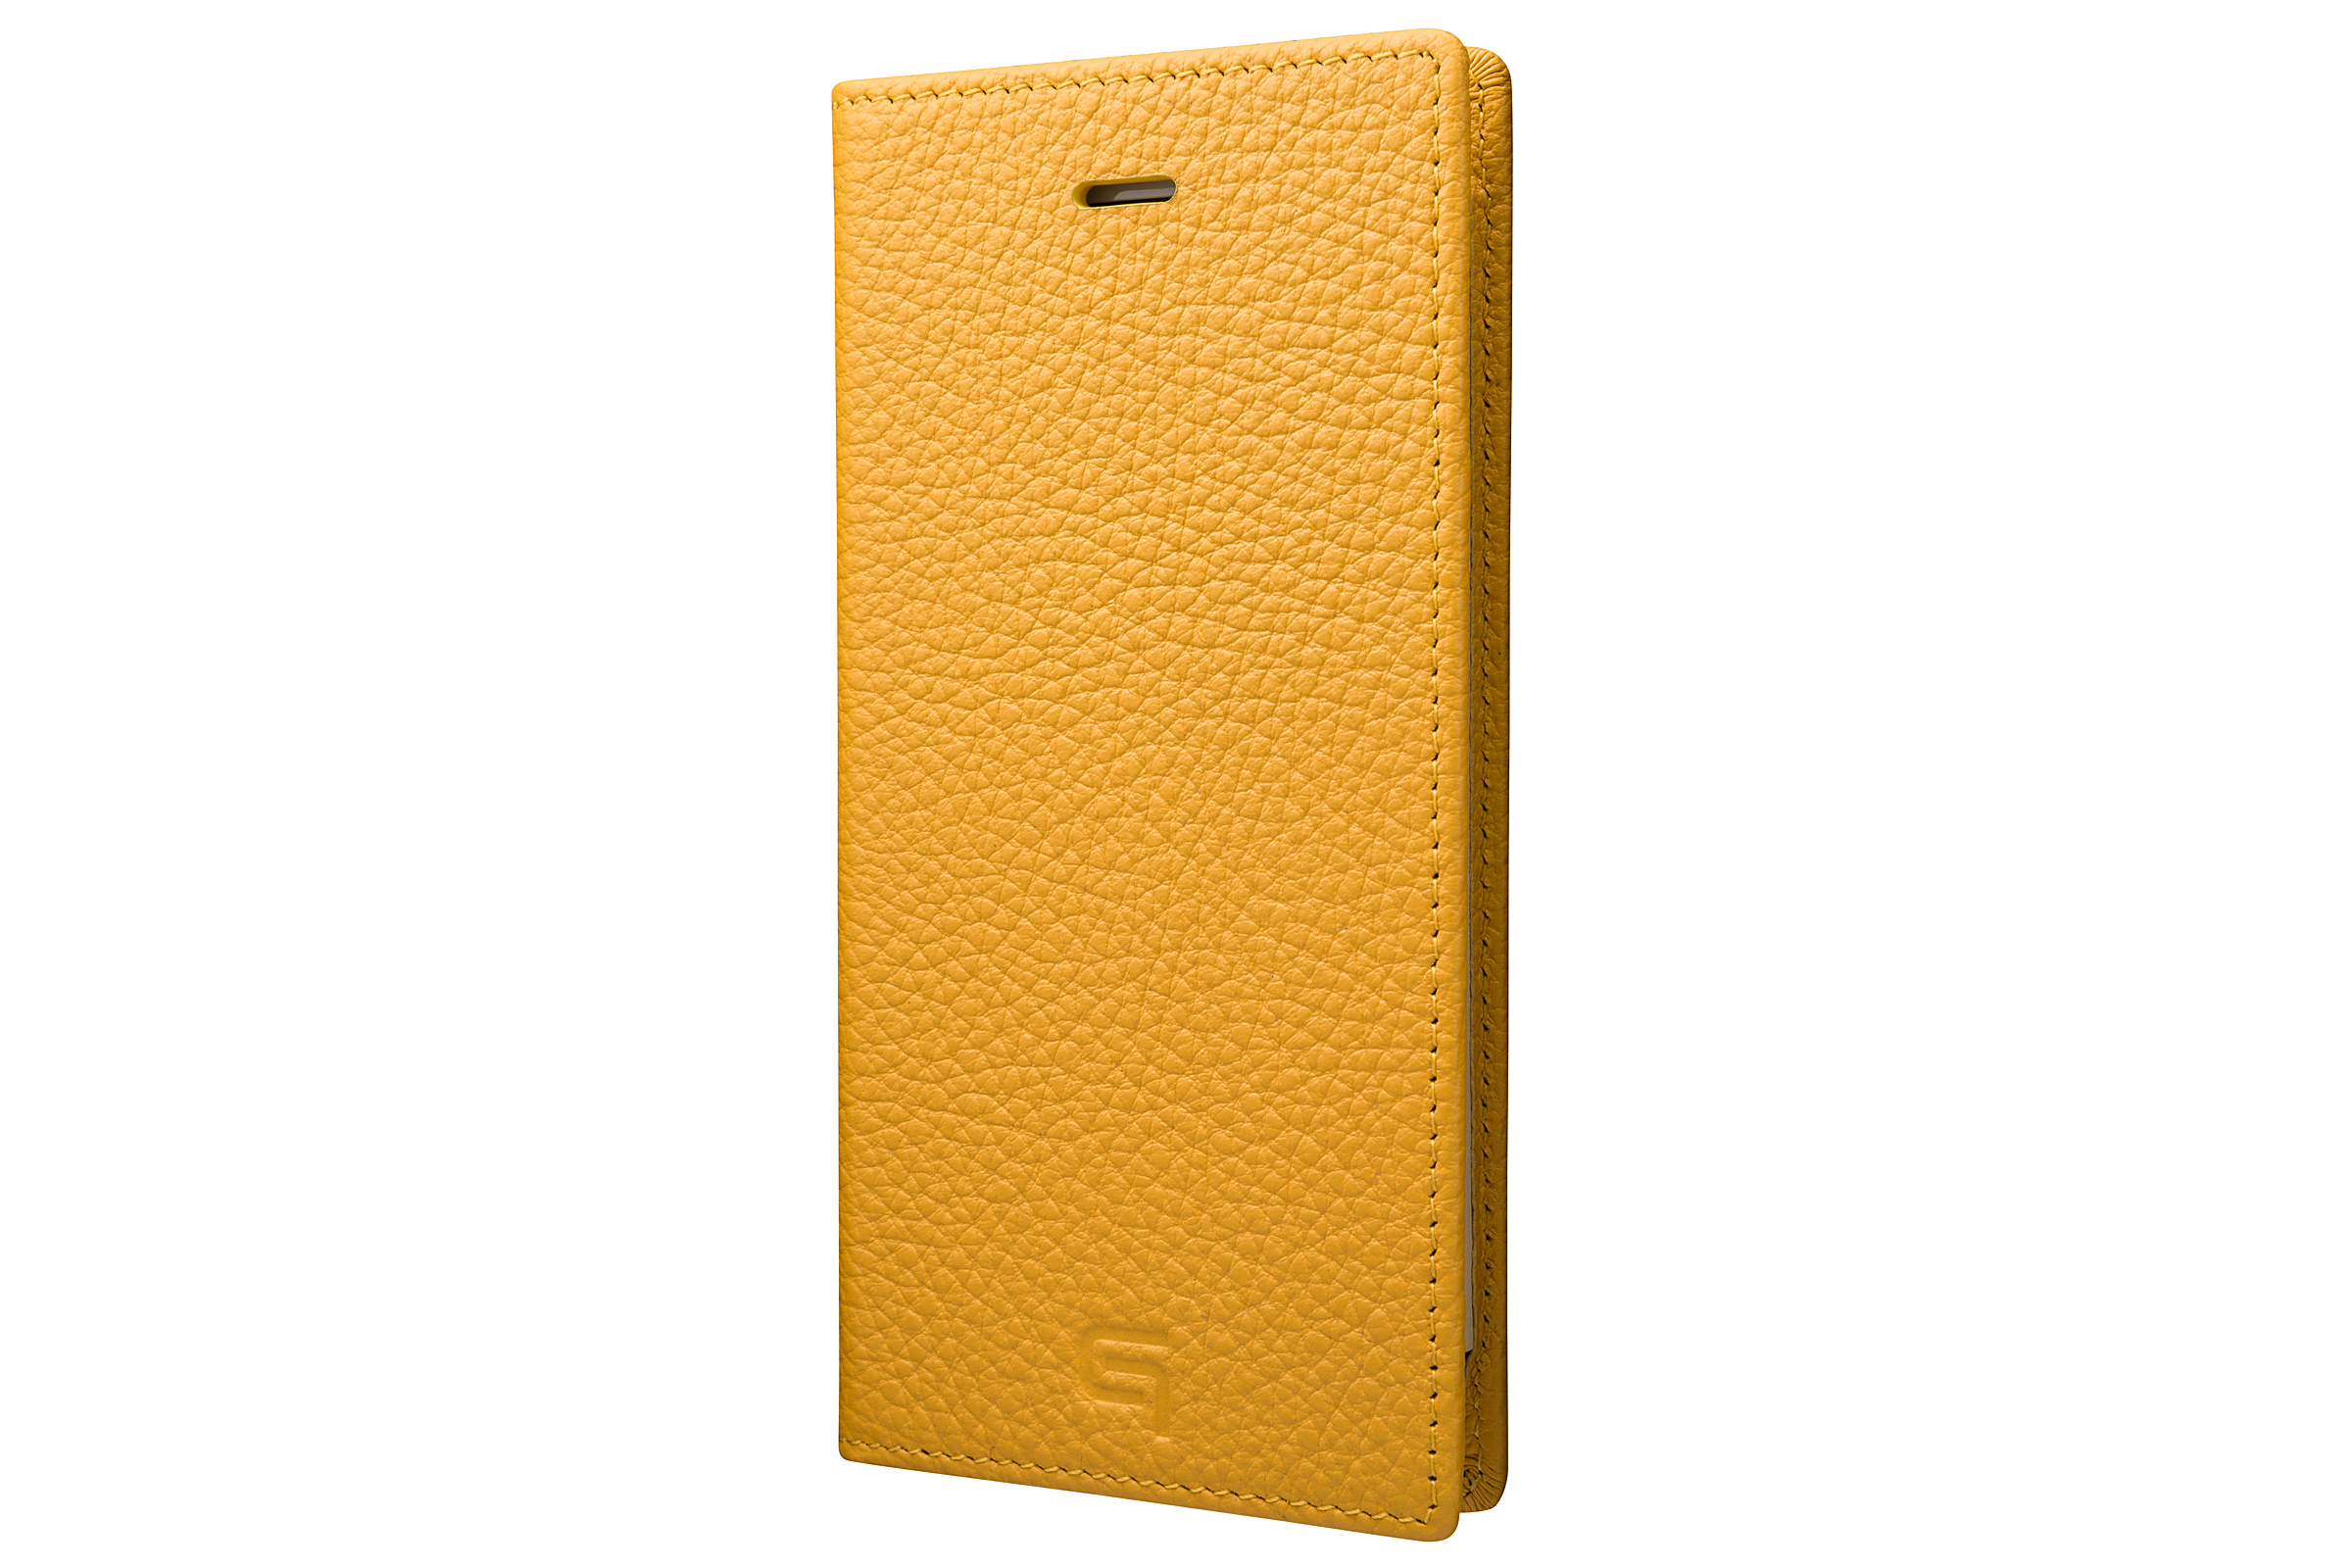 GRAMAS Shrunken-calf Full Leather Case for iPhone 7(Yellow) シュランケンカーフ 手帳型フルレザーケース - 画像1